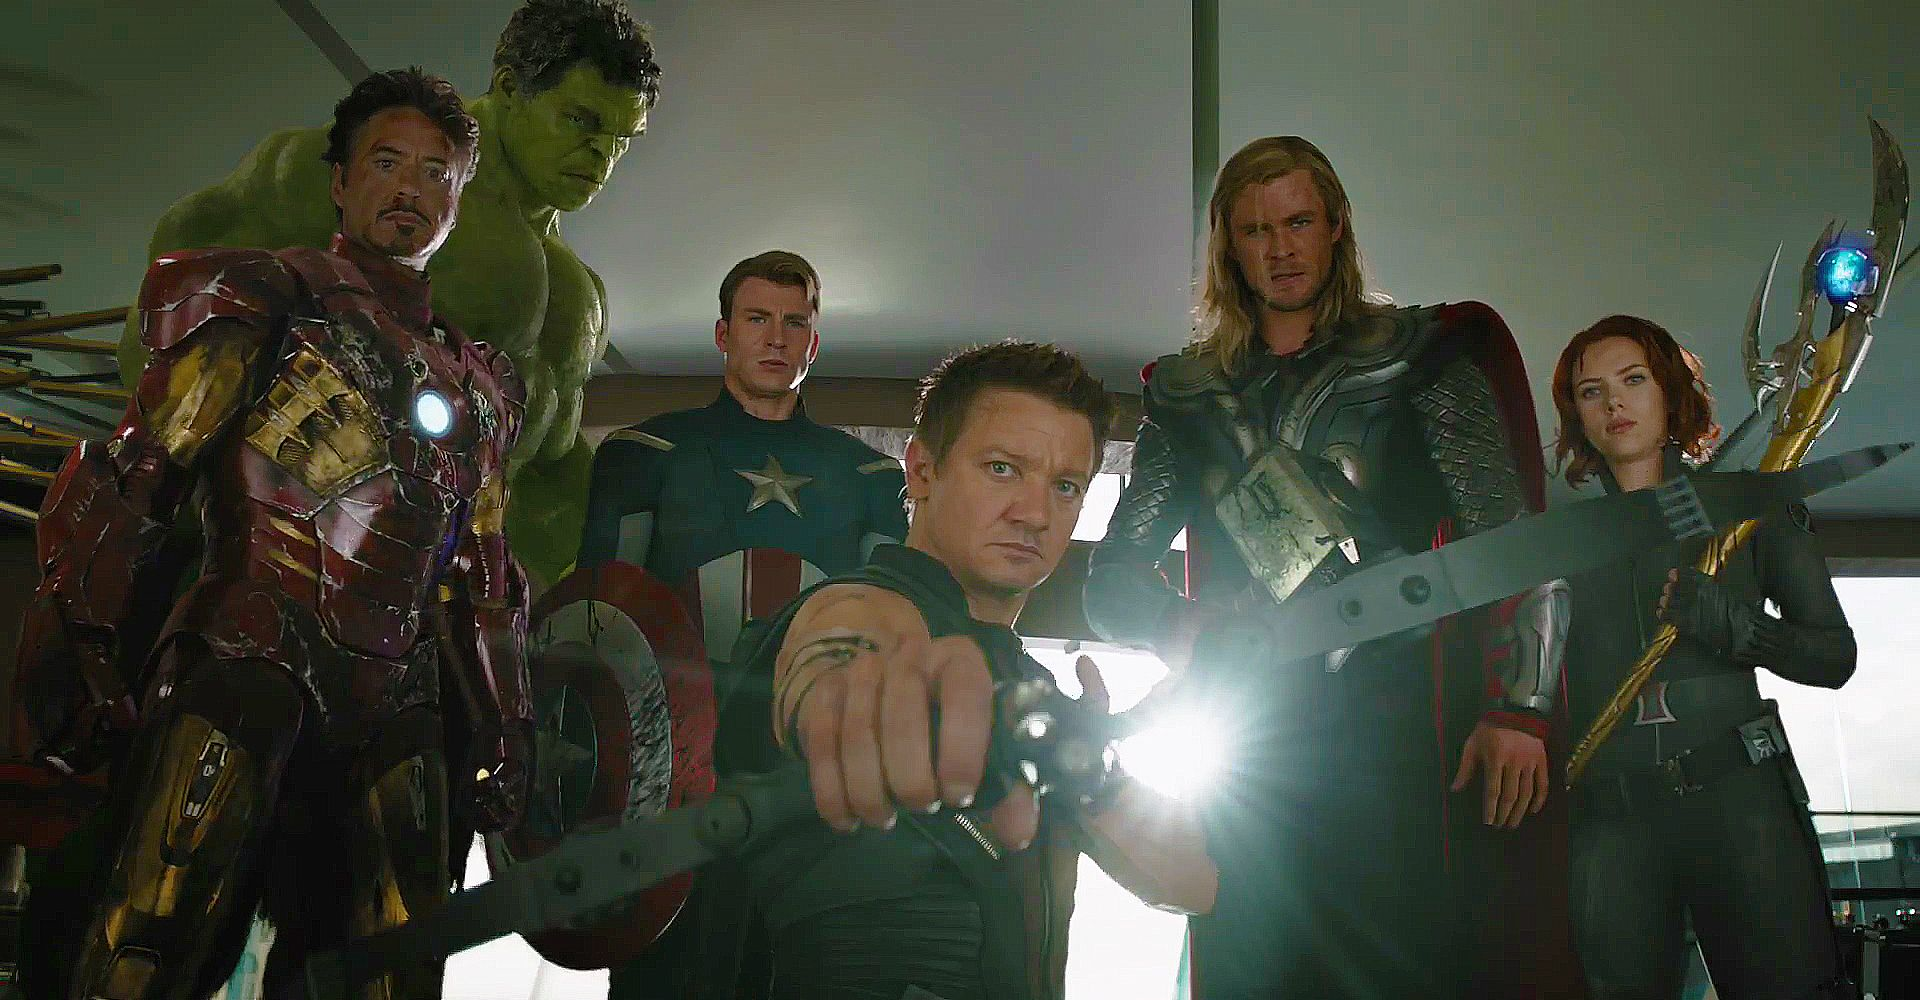 Avengers_post-battle.png